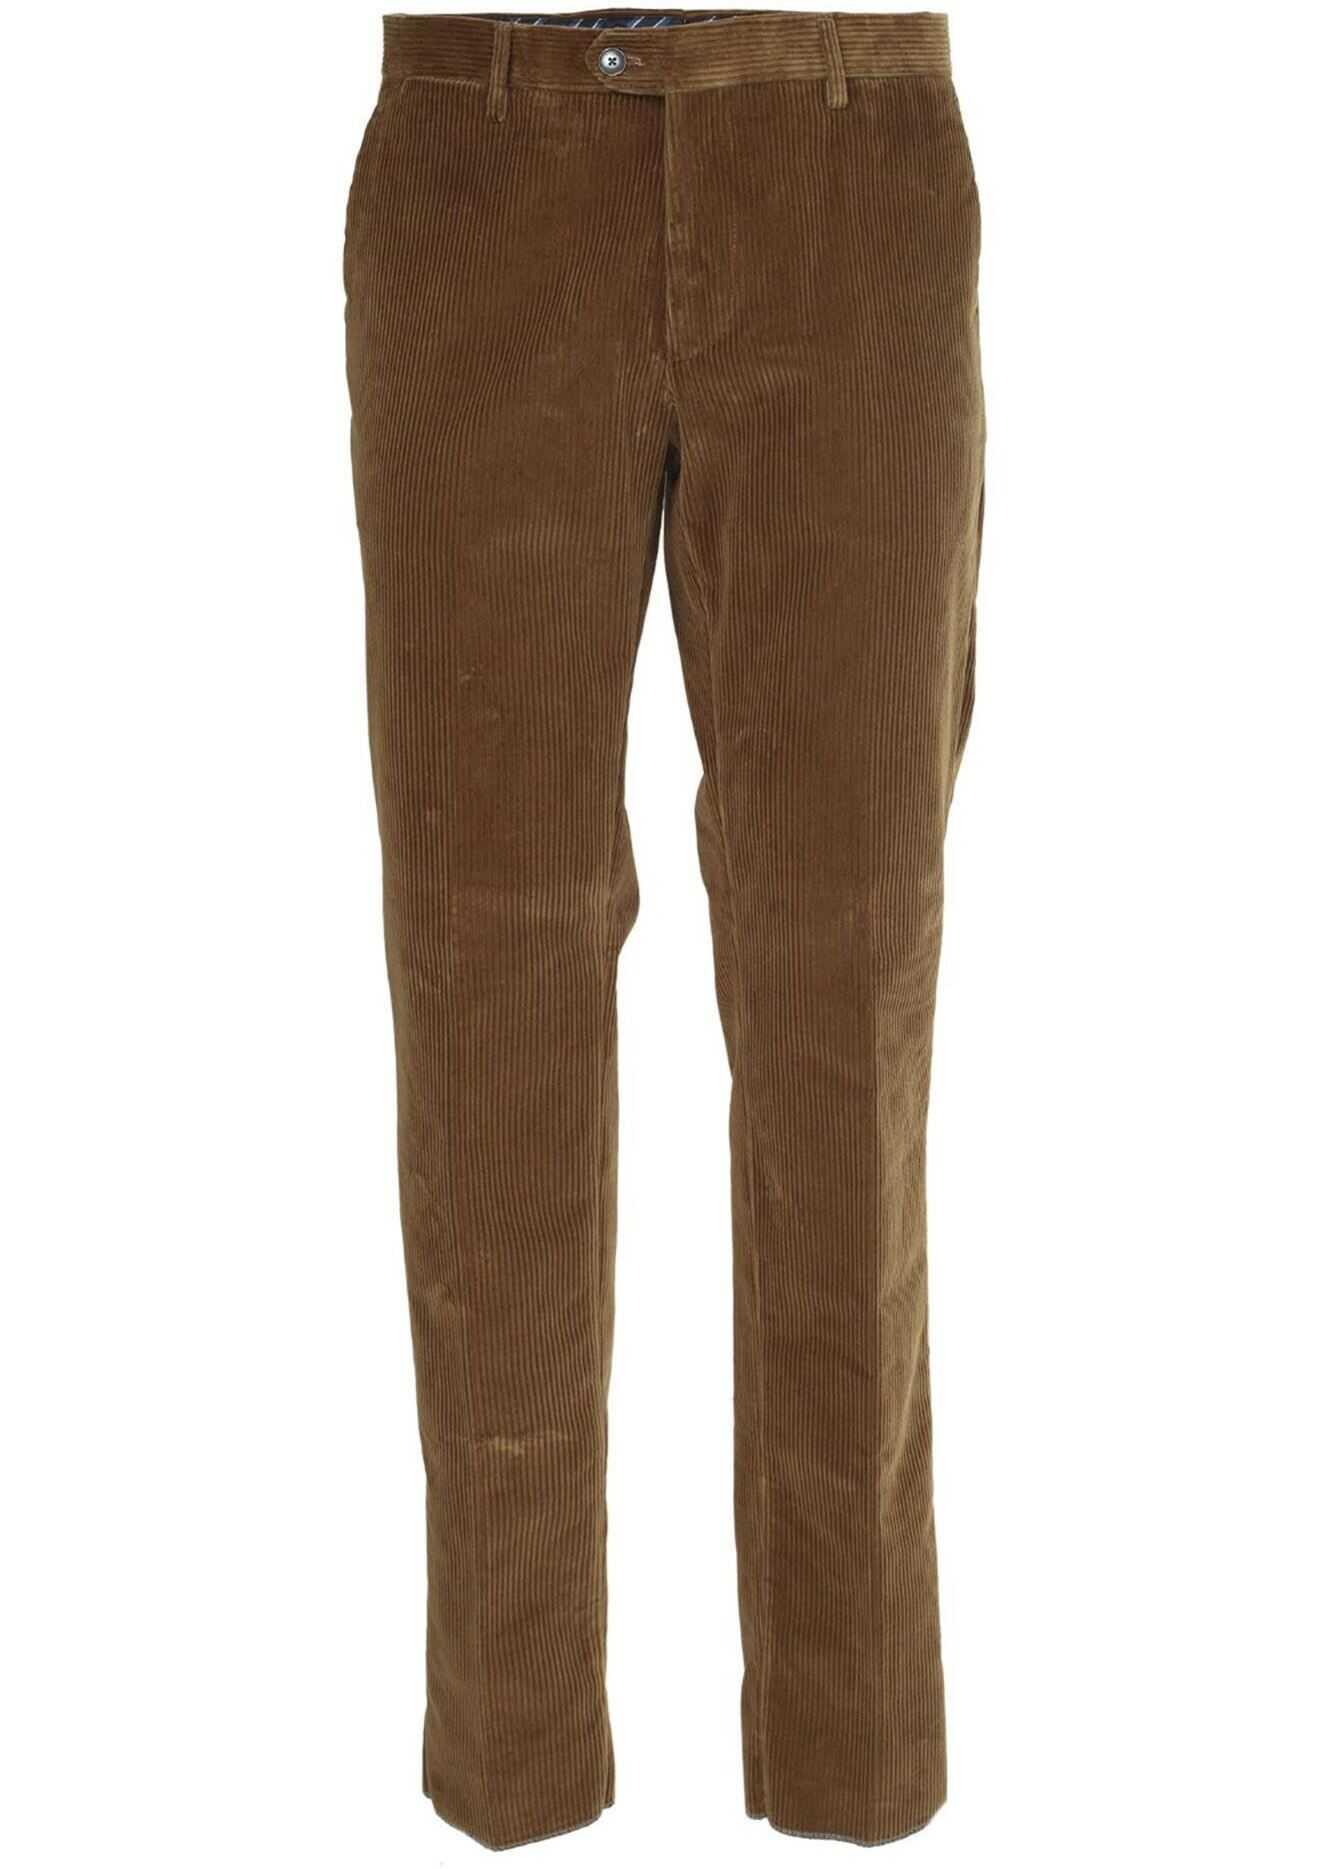 ETRO Corduroy Trousers In Brown Brown imagine